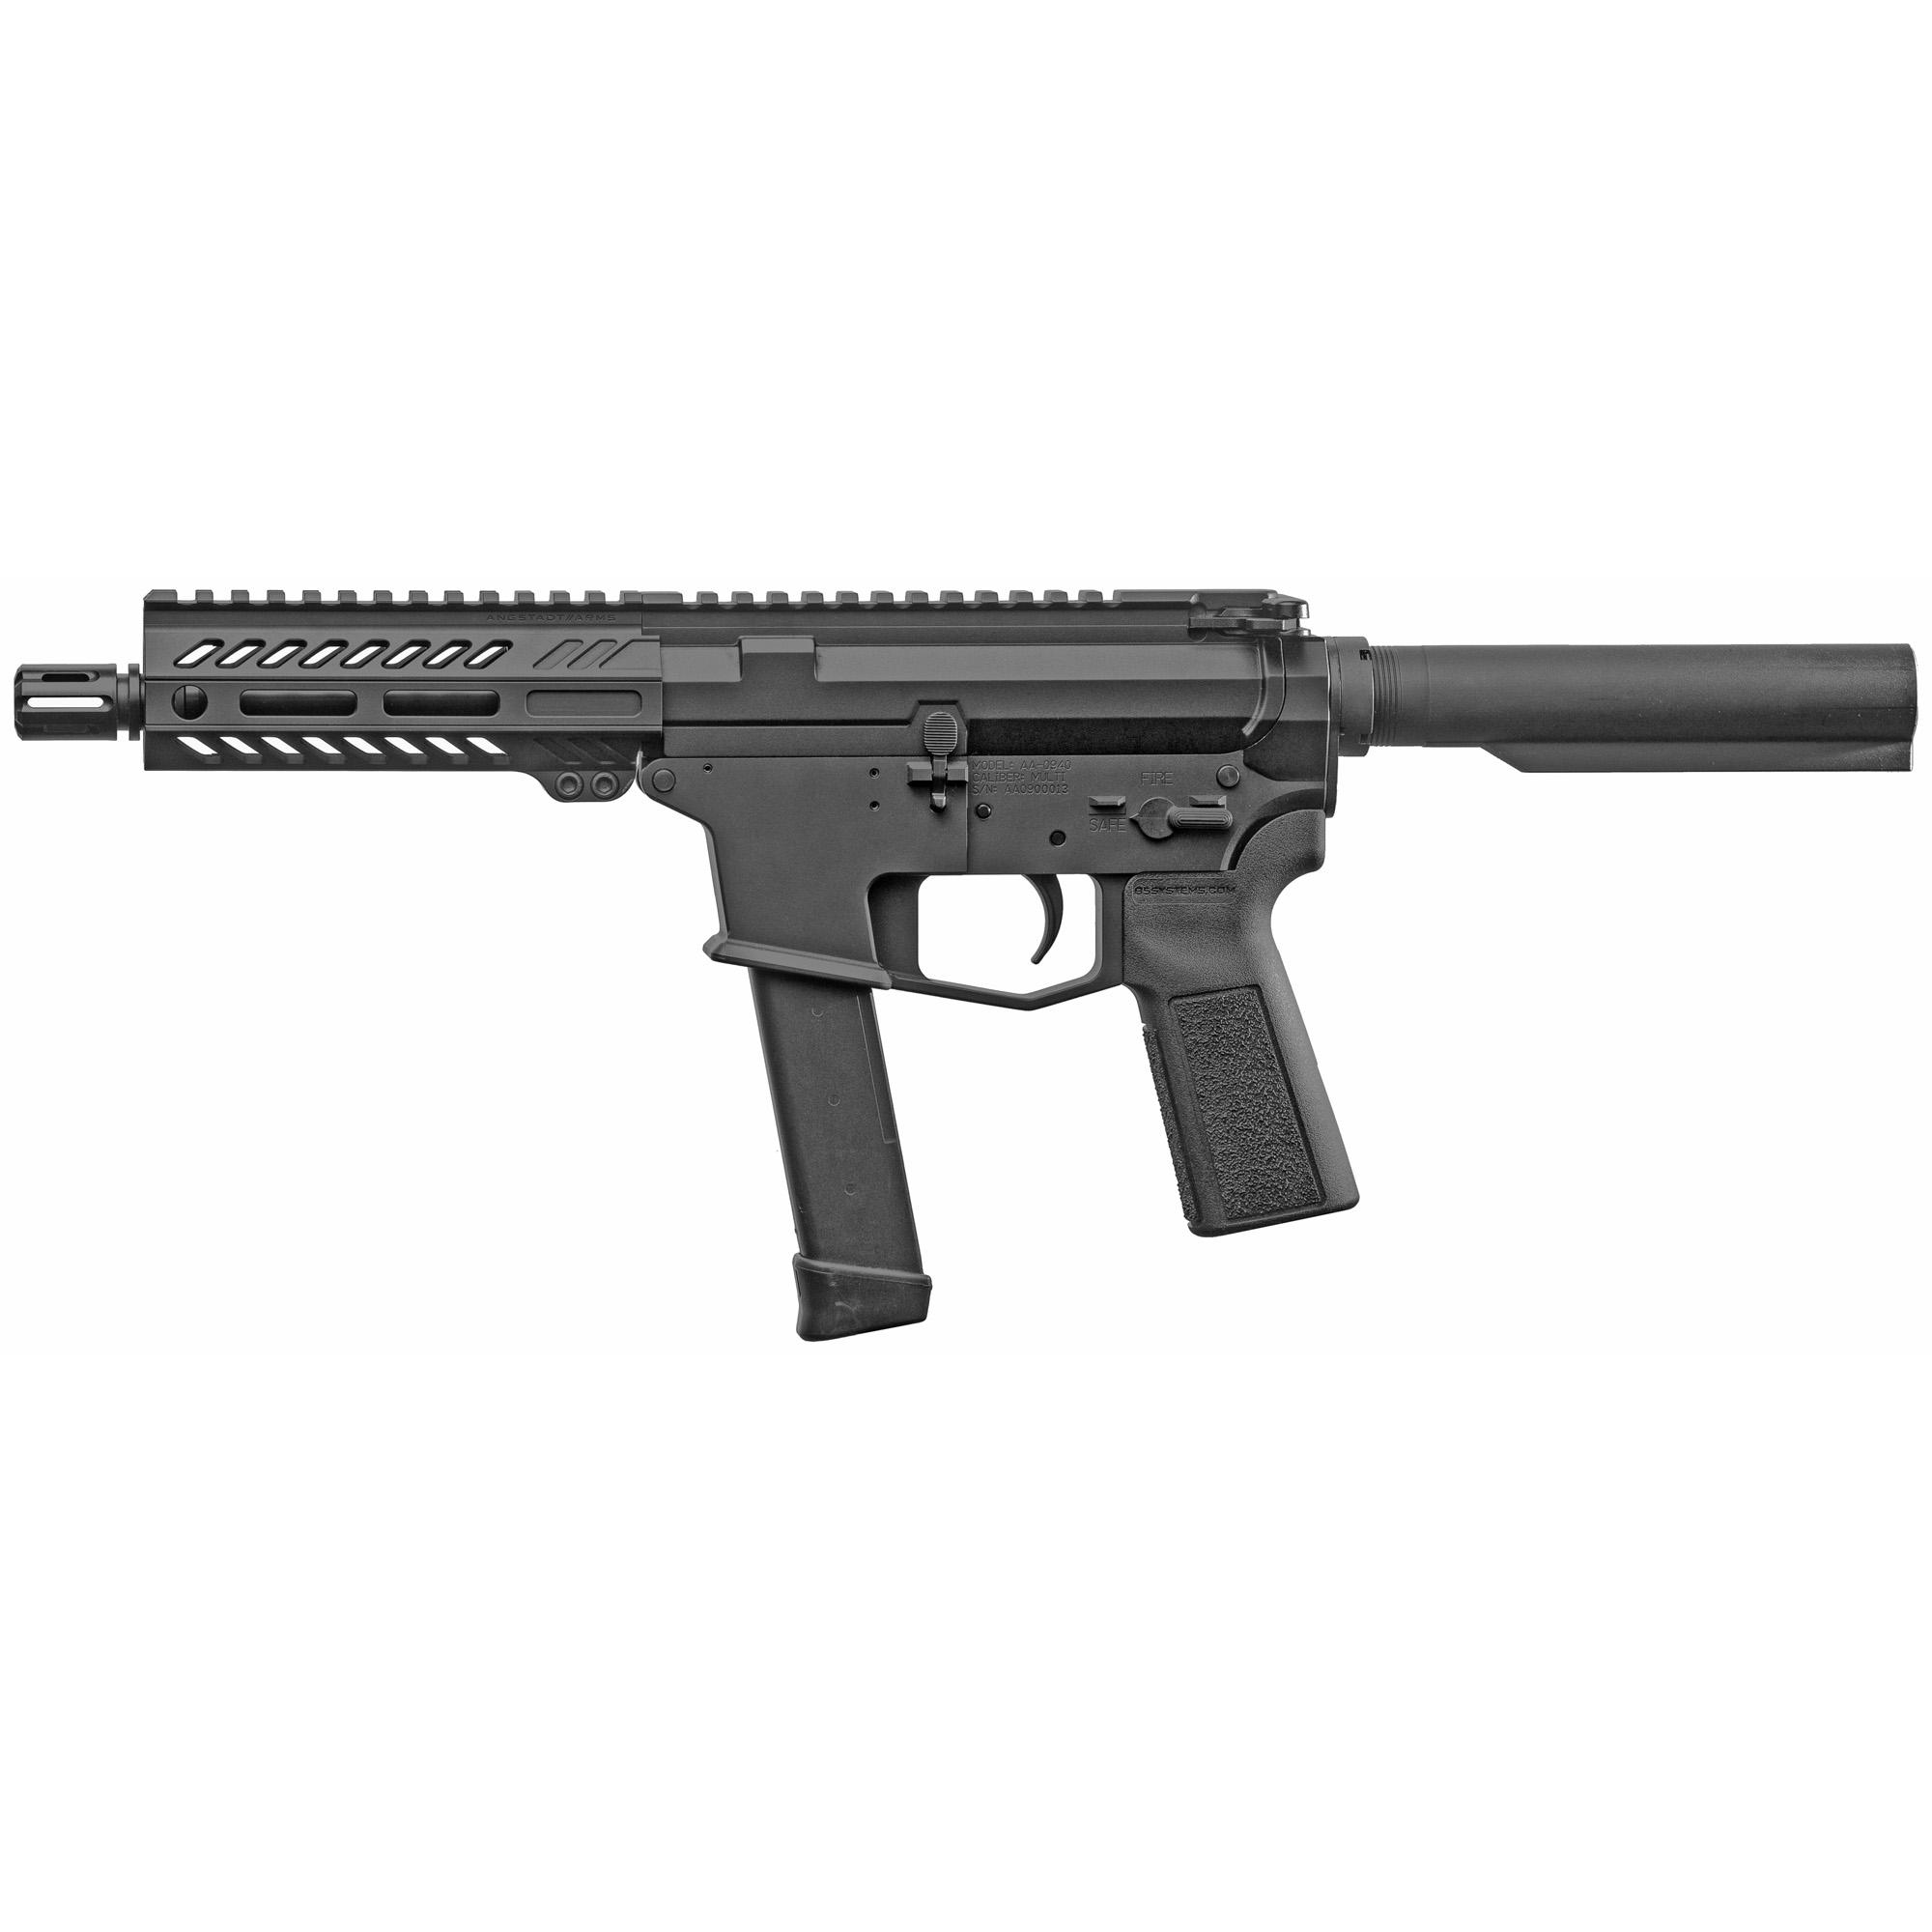 "Angstadt Udp-9 Pistol 9mm 6"" 17rd"